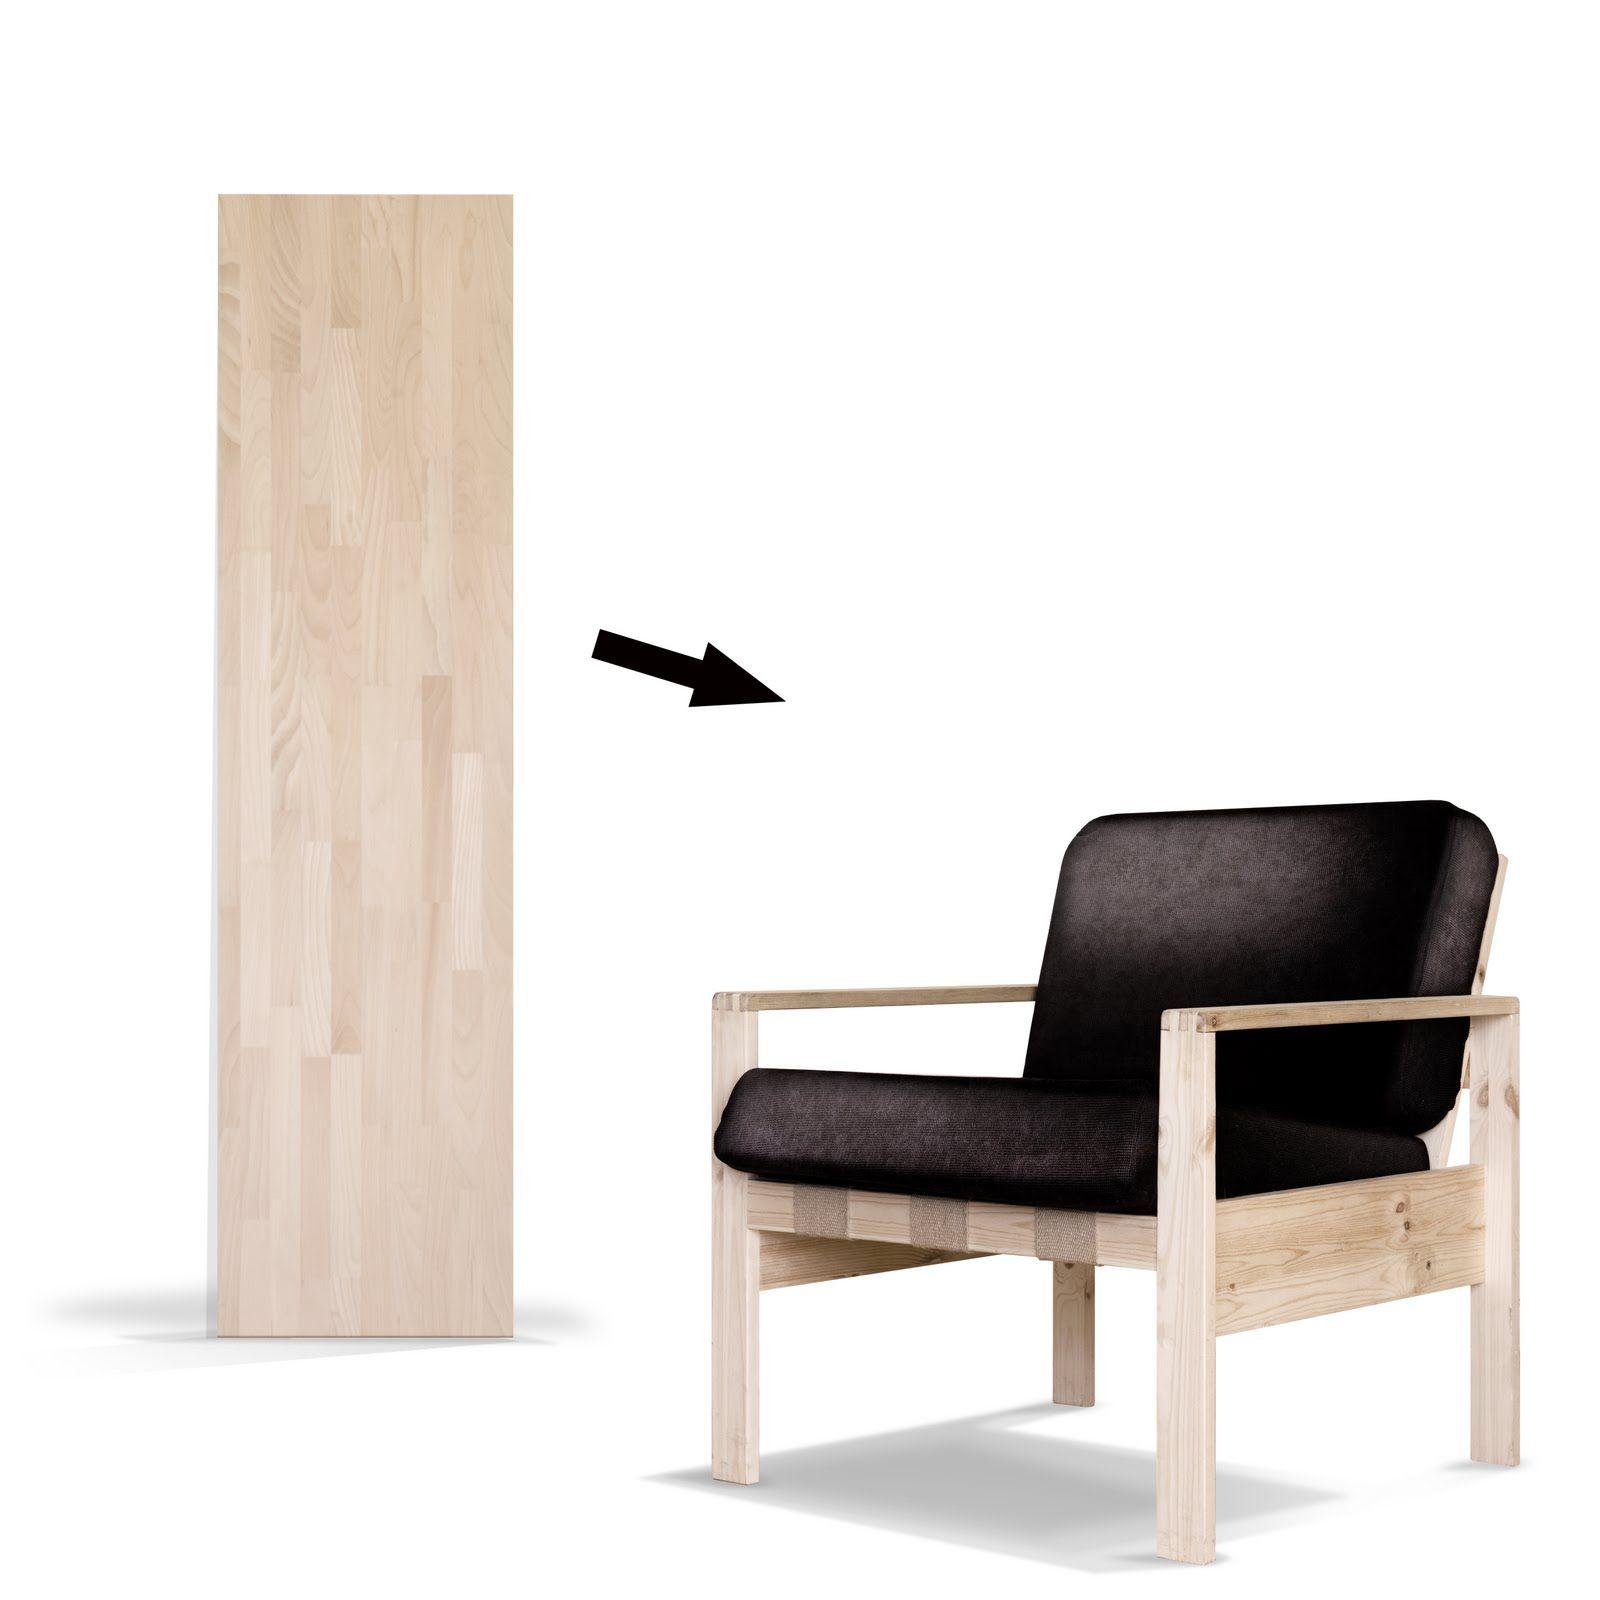 hartz iv möbel: 24 euro sessel (24 euro chair) in 2020